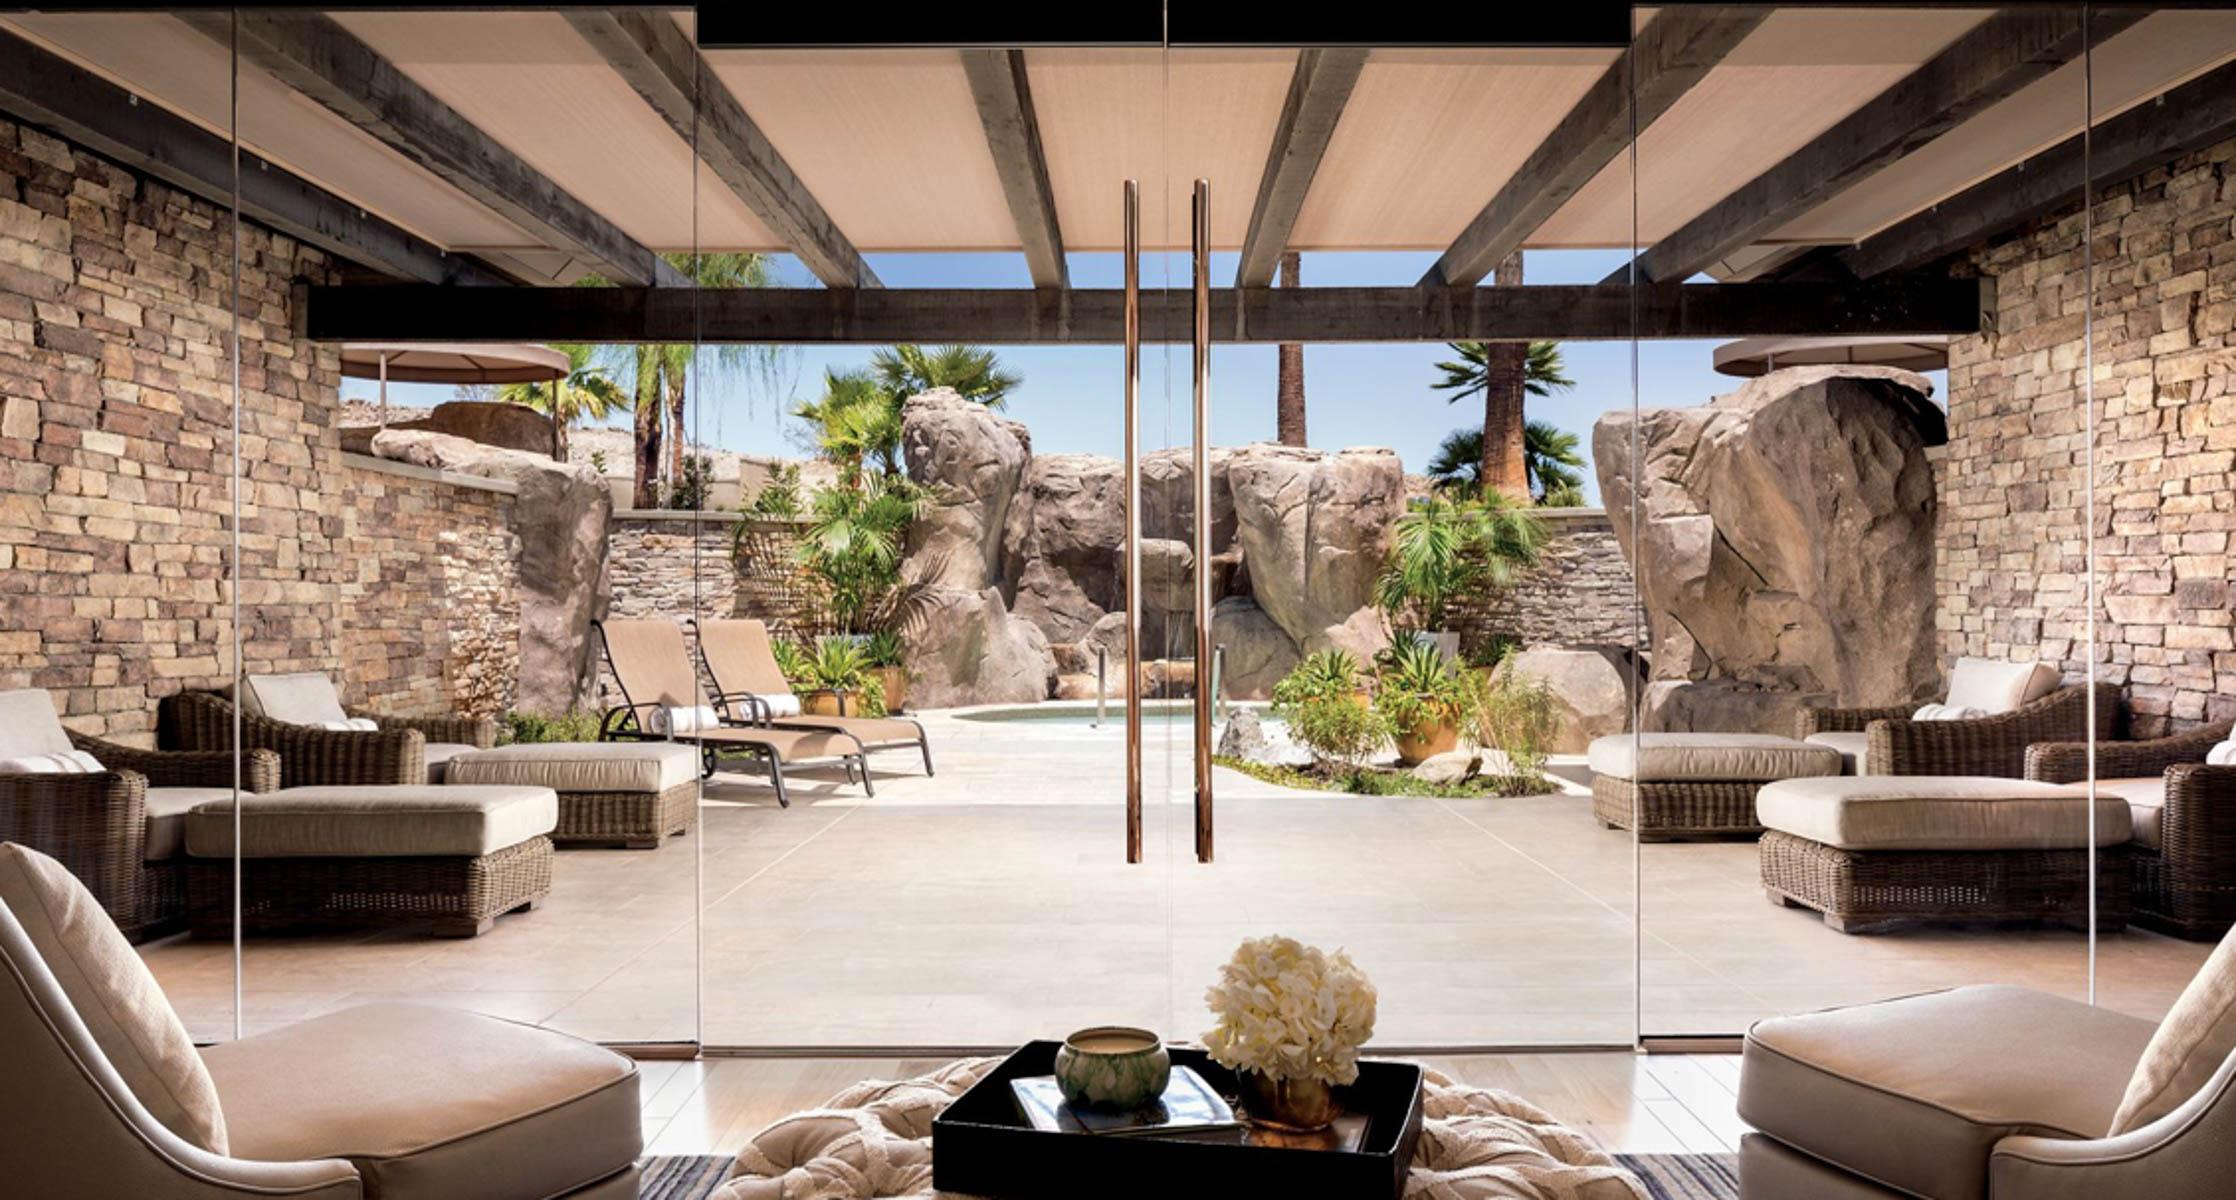 Best Palm Desert Travel Ideas_Palm Desert Hotels_Palm Desert_resorts_Addie Bell-19.jpg